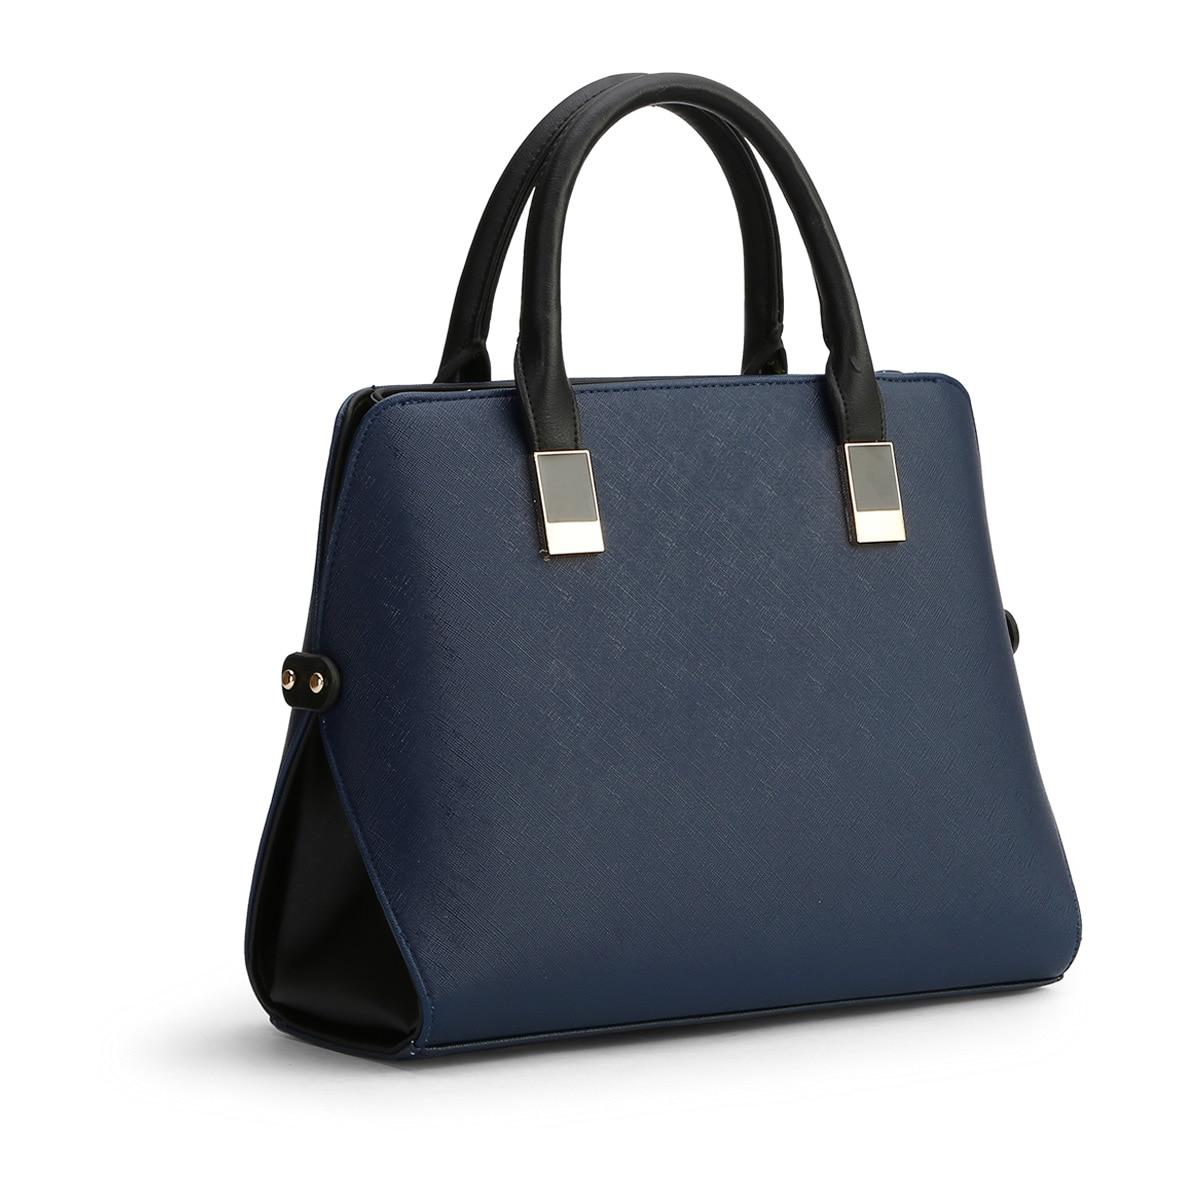 Women Bag 2017 Waist Shape Portable Oblique Cross Single Shoulder Bag women Shell PU leather handbag messenger bags High Quality